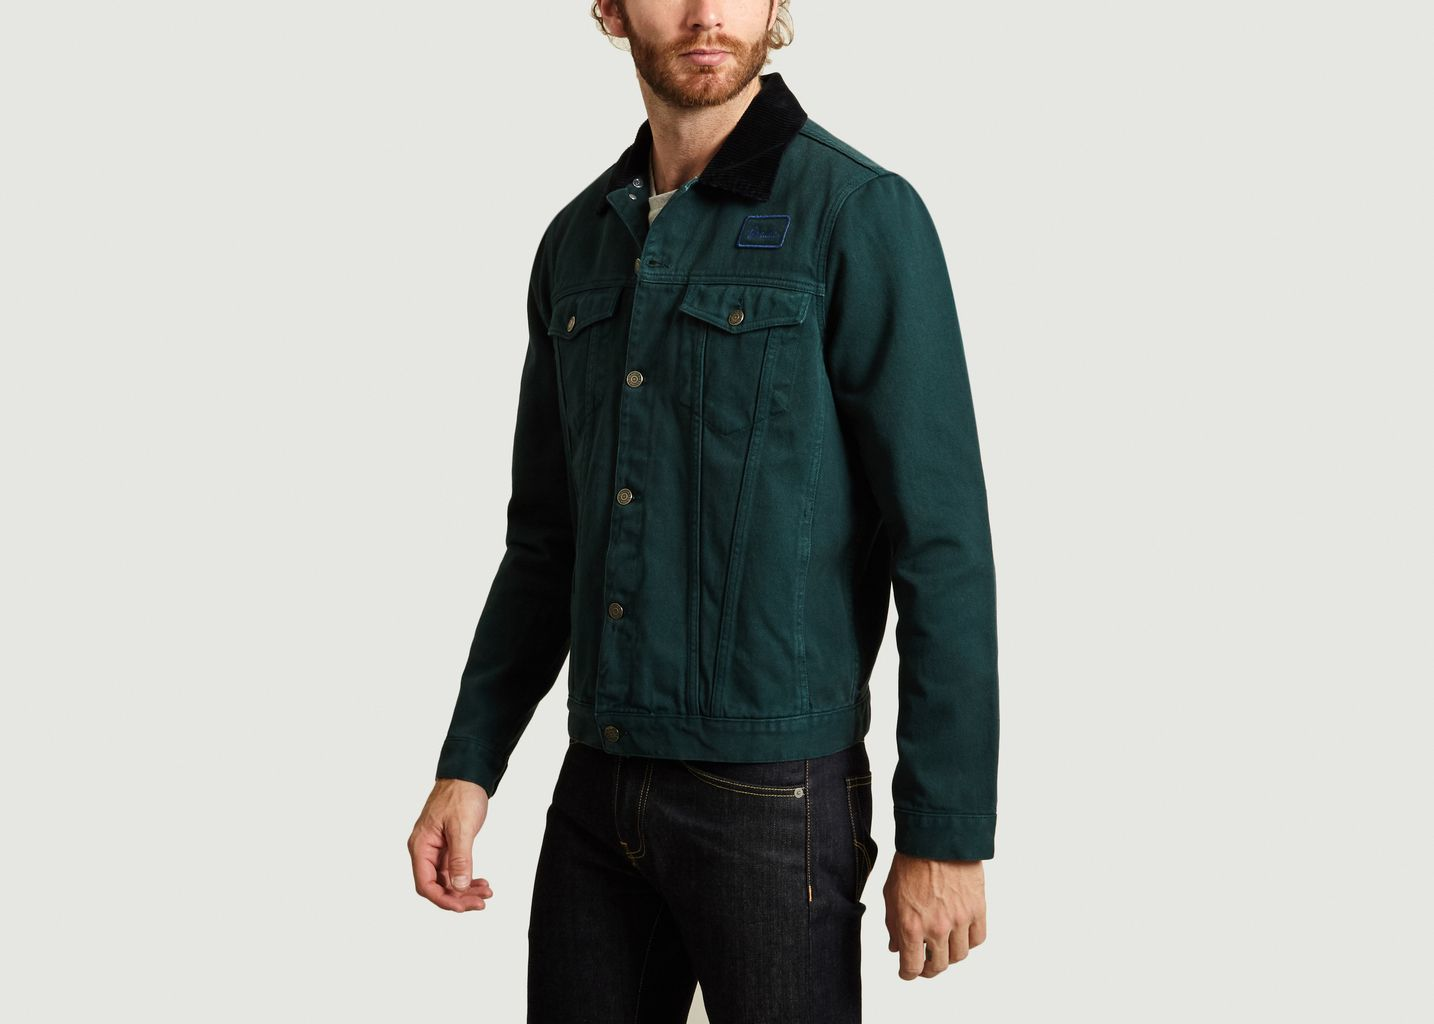 Shearling Jacket The Dude - Maison Labiche